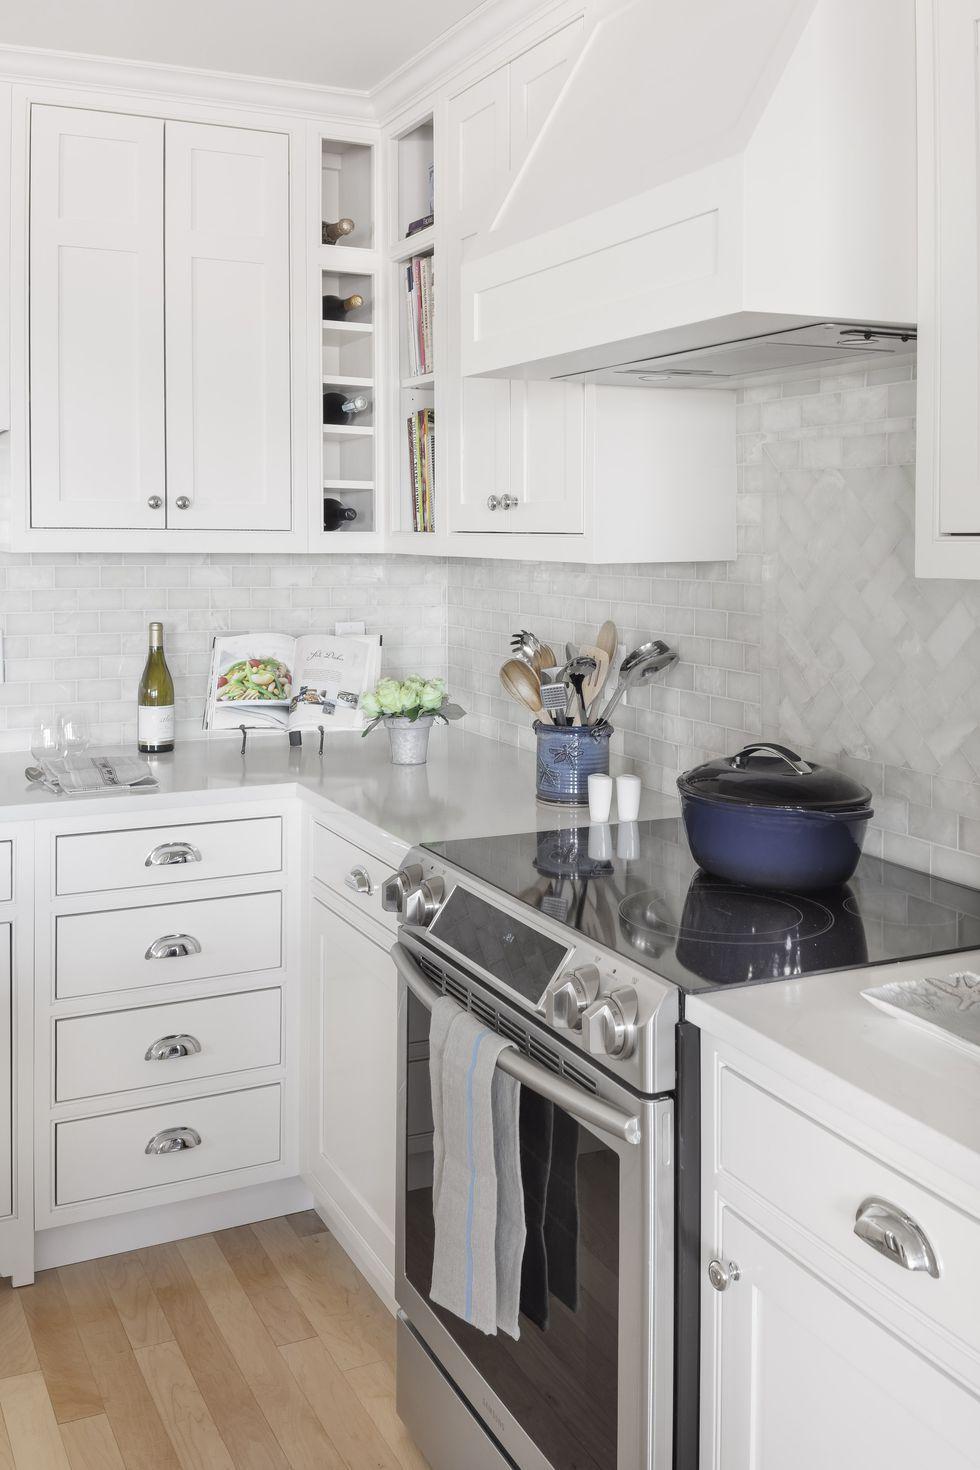 20 Gorgeous Kitchen Tile Backsplashes - Best Kitchen Tile Ideas